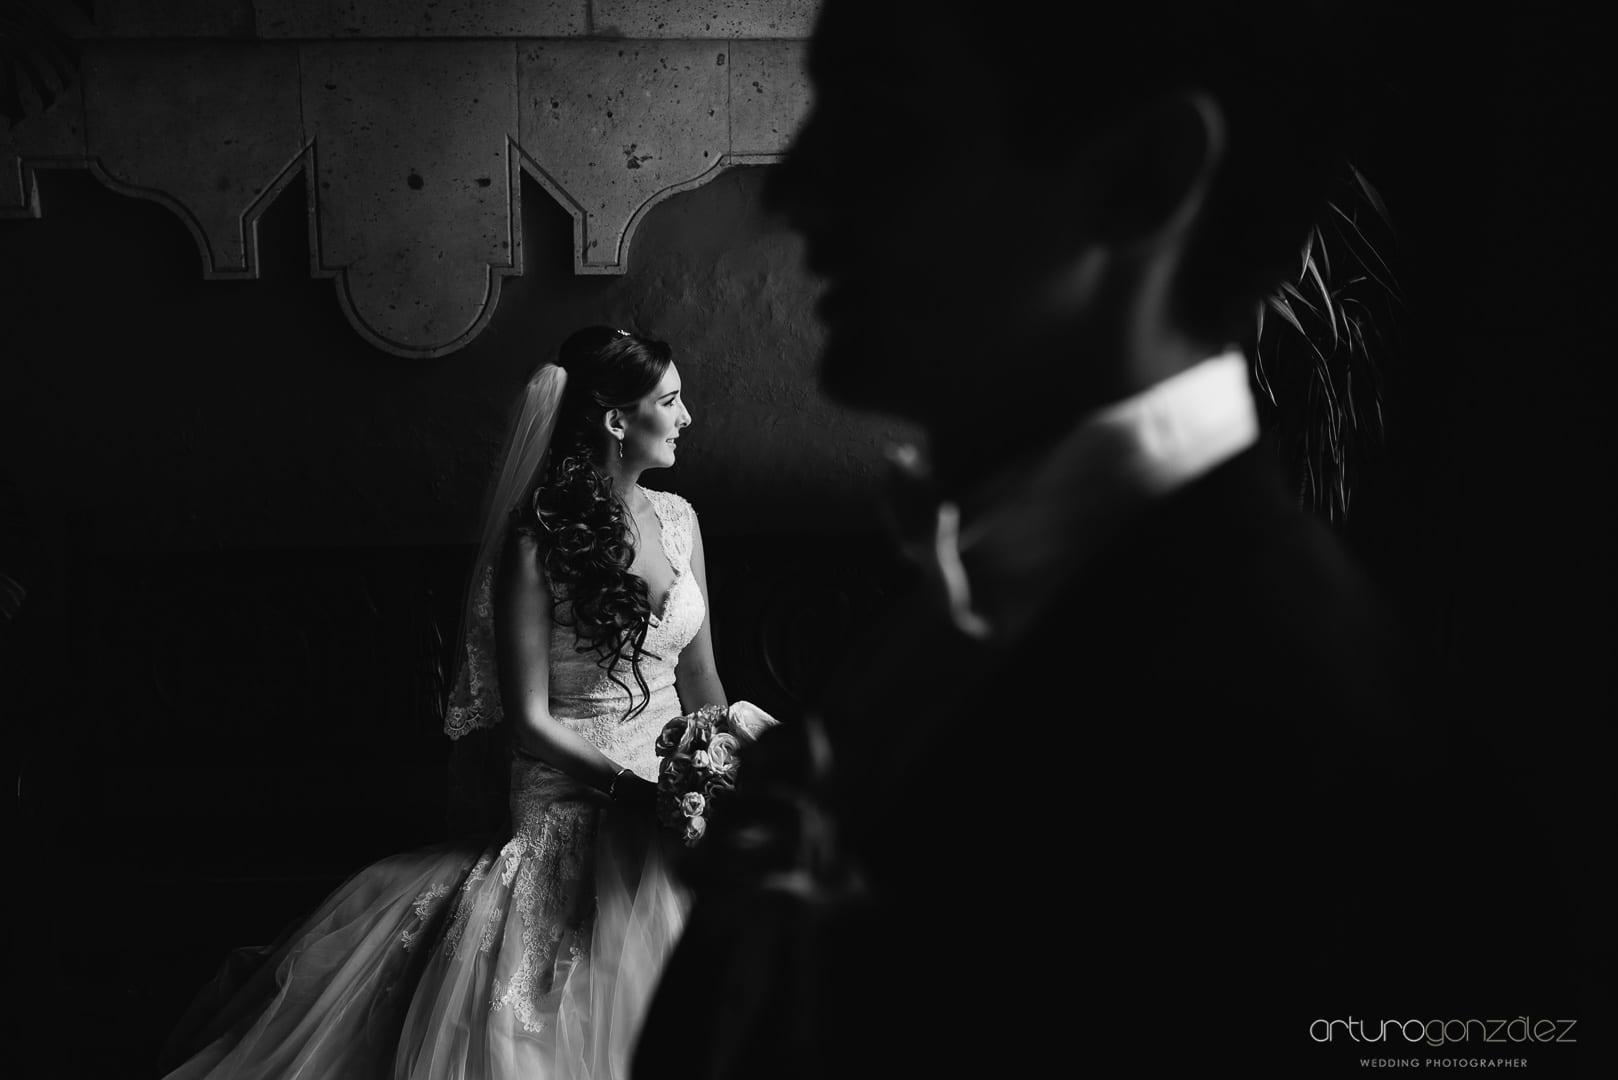 fotografo-de-bodas-en-guanajuato-29